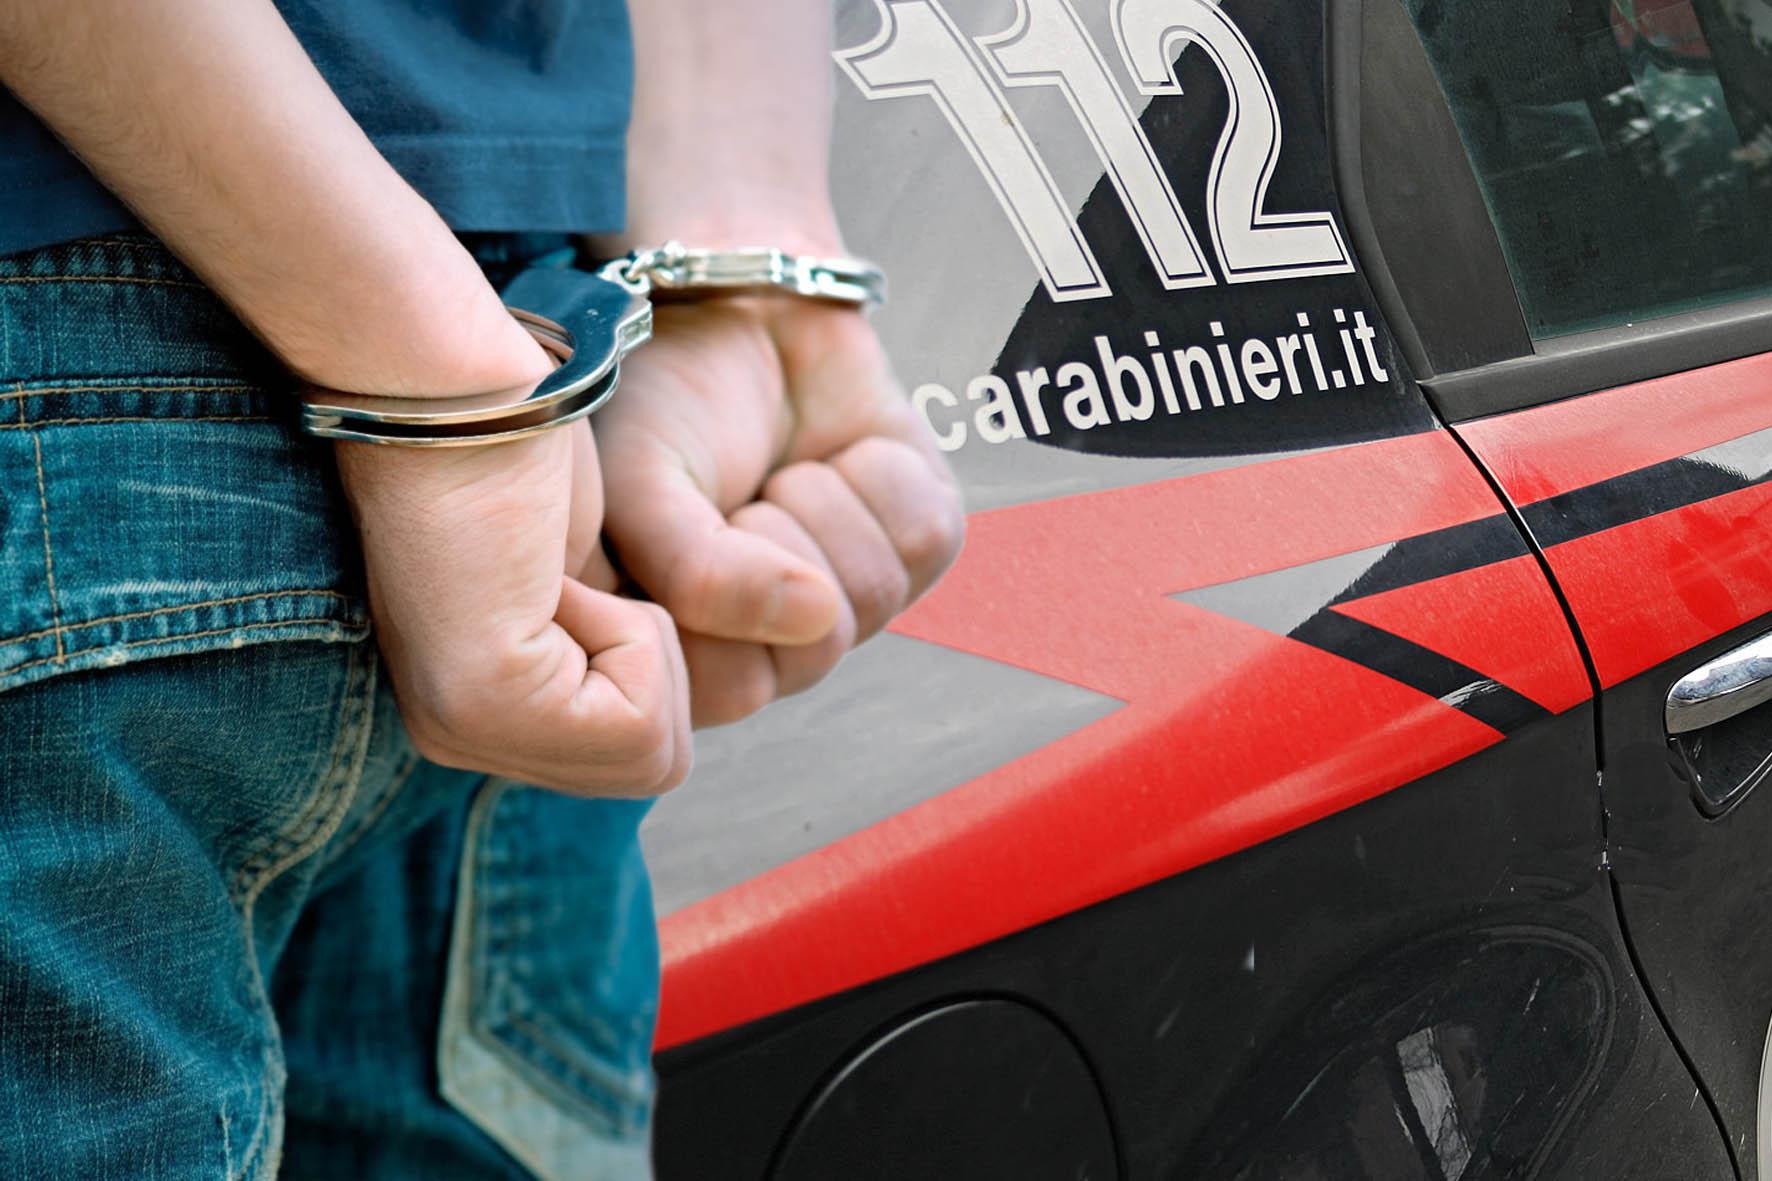 Stalking all'ex compagna: arrestato dai carabinieri